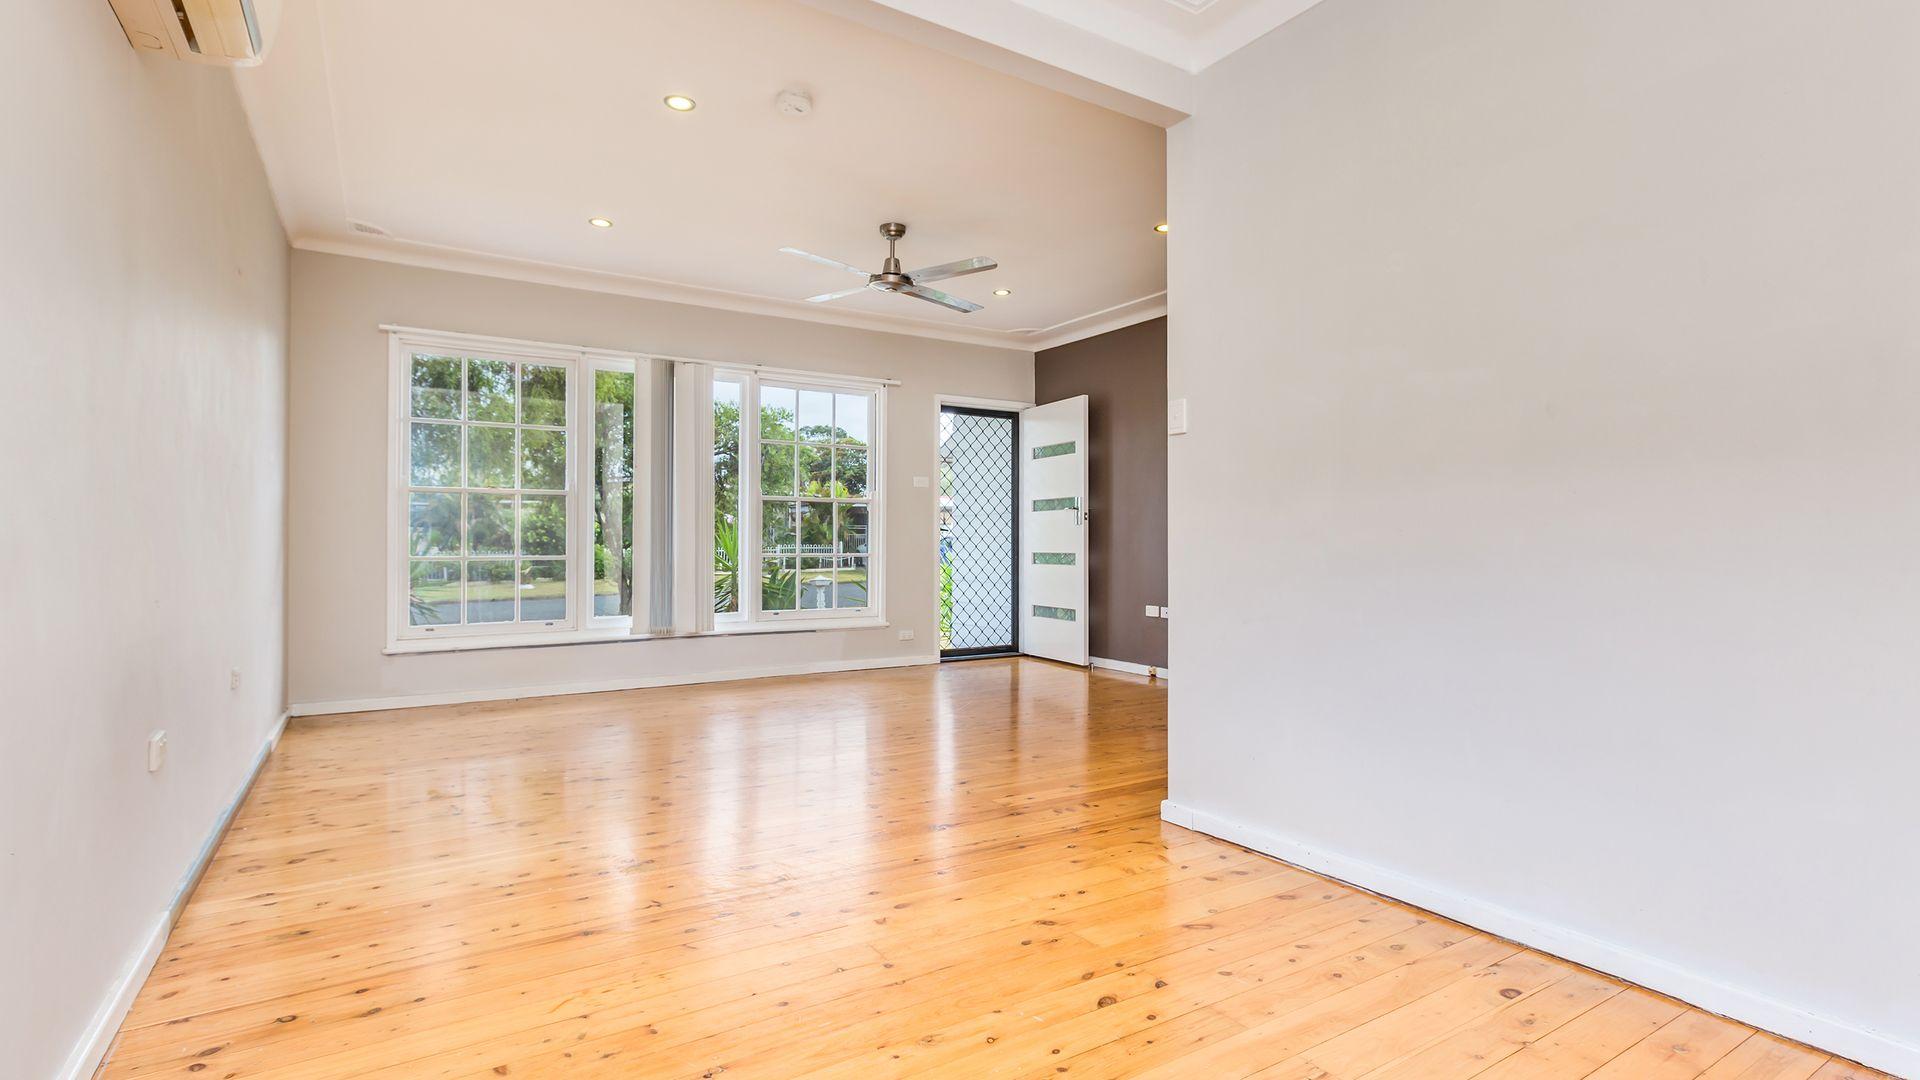 25 Enright Street, Beresfield NSW 2322, Image 1